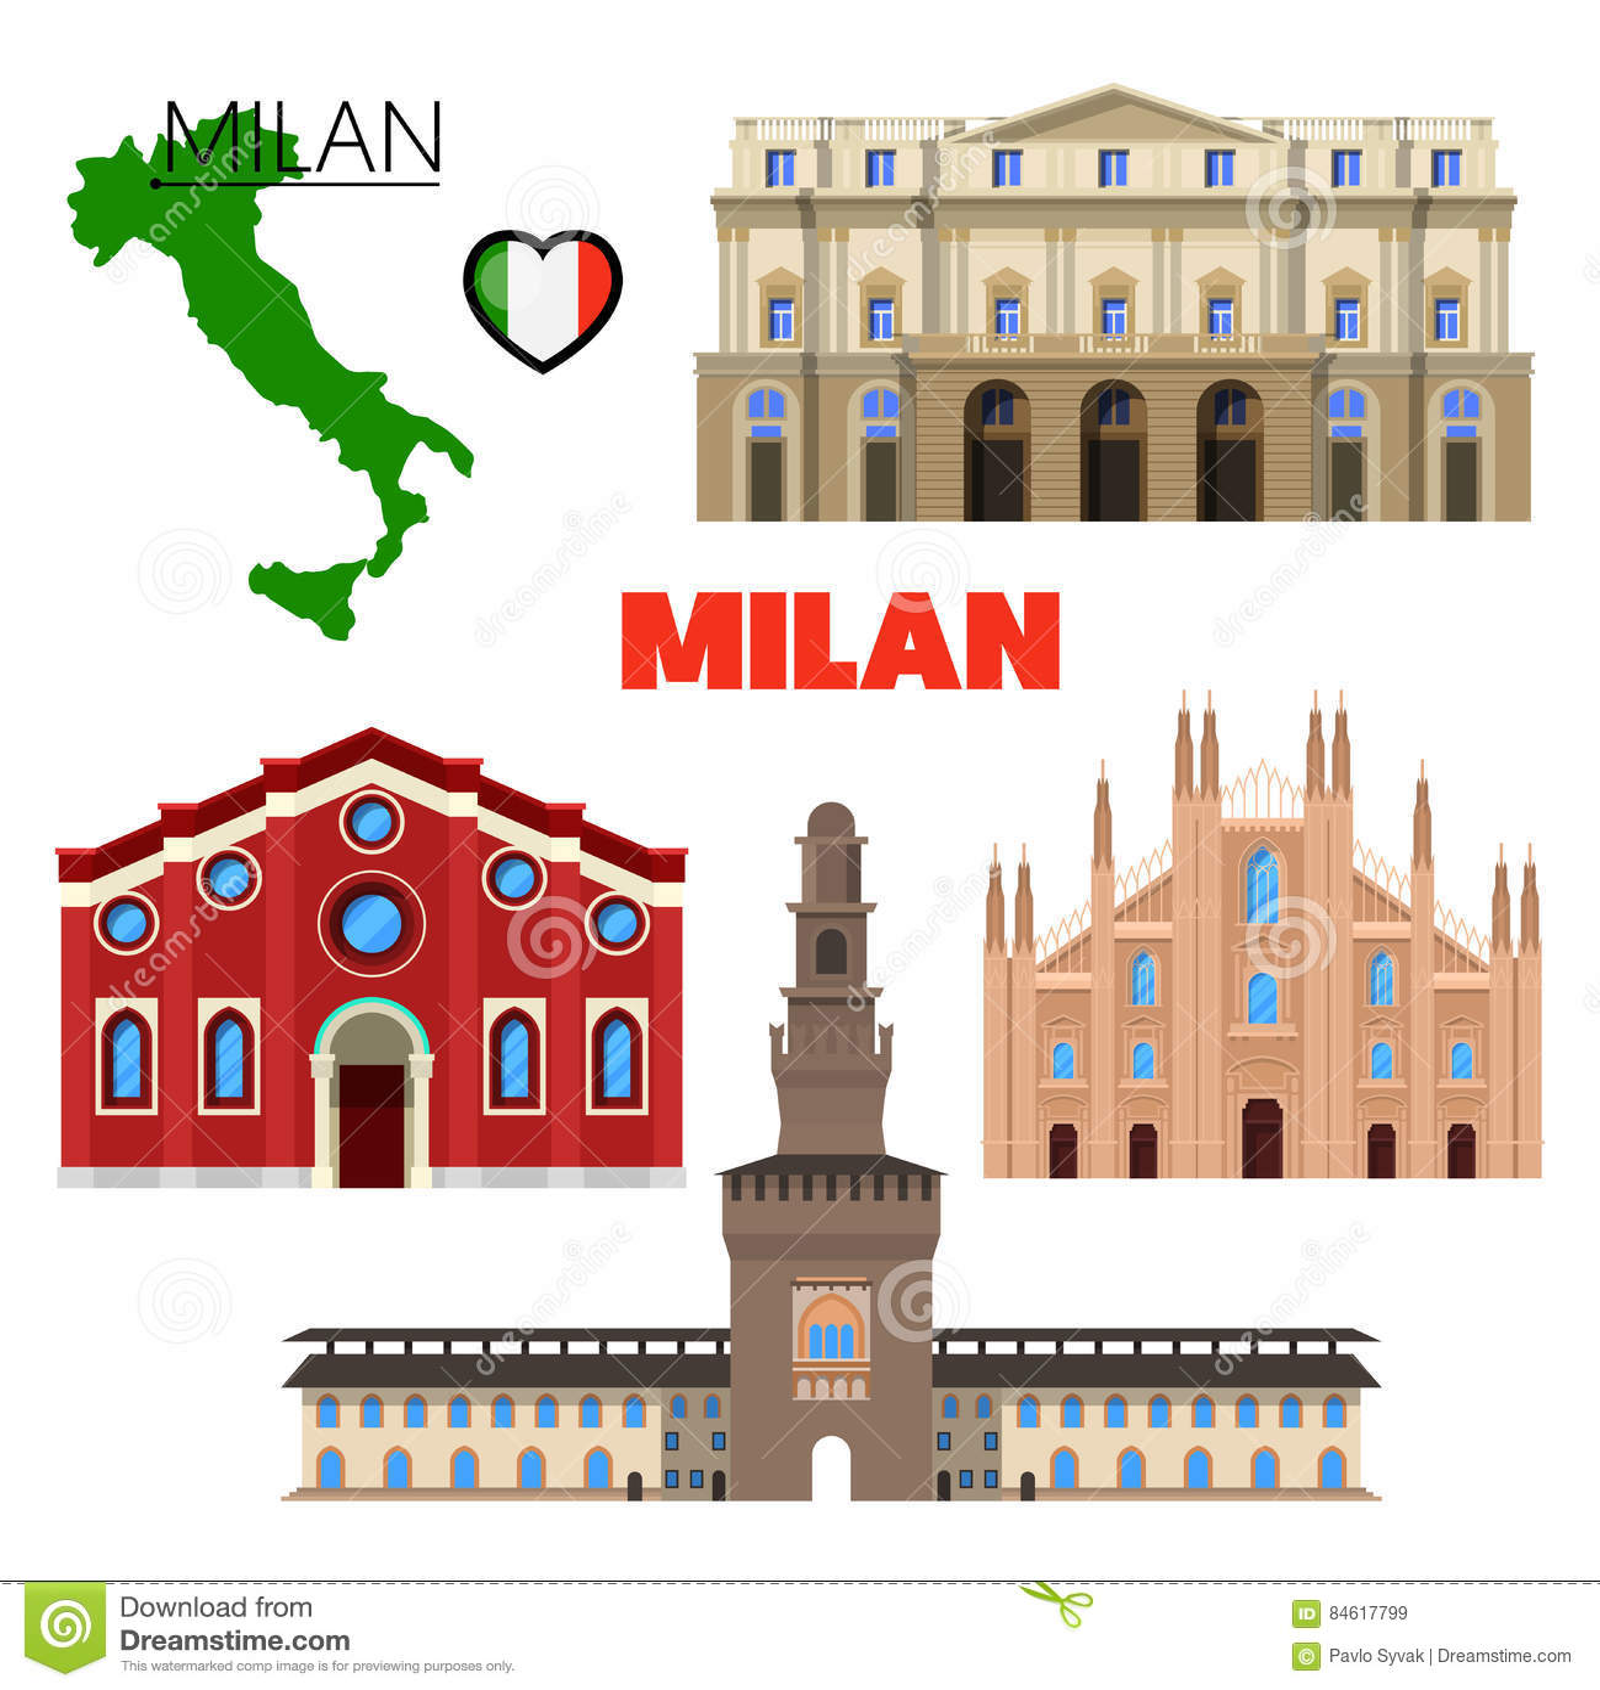 Milan Italy Travel Doodle met Architectuur, Kaart en Vlag